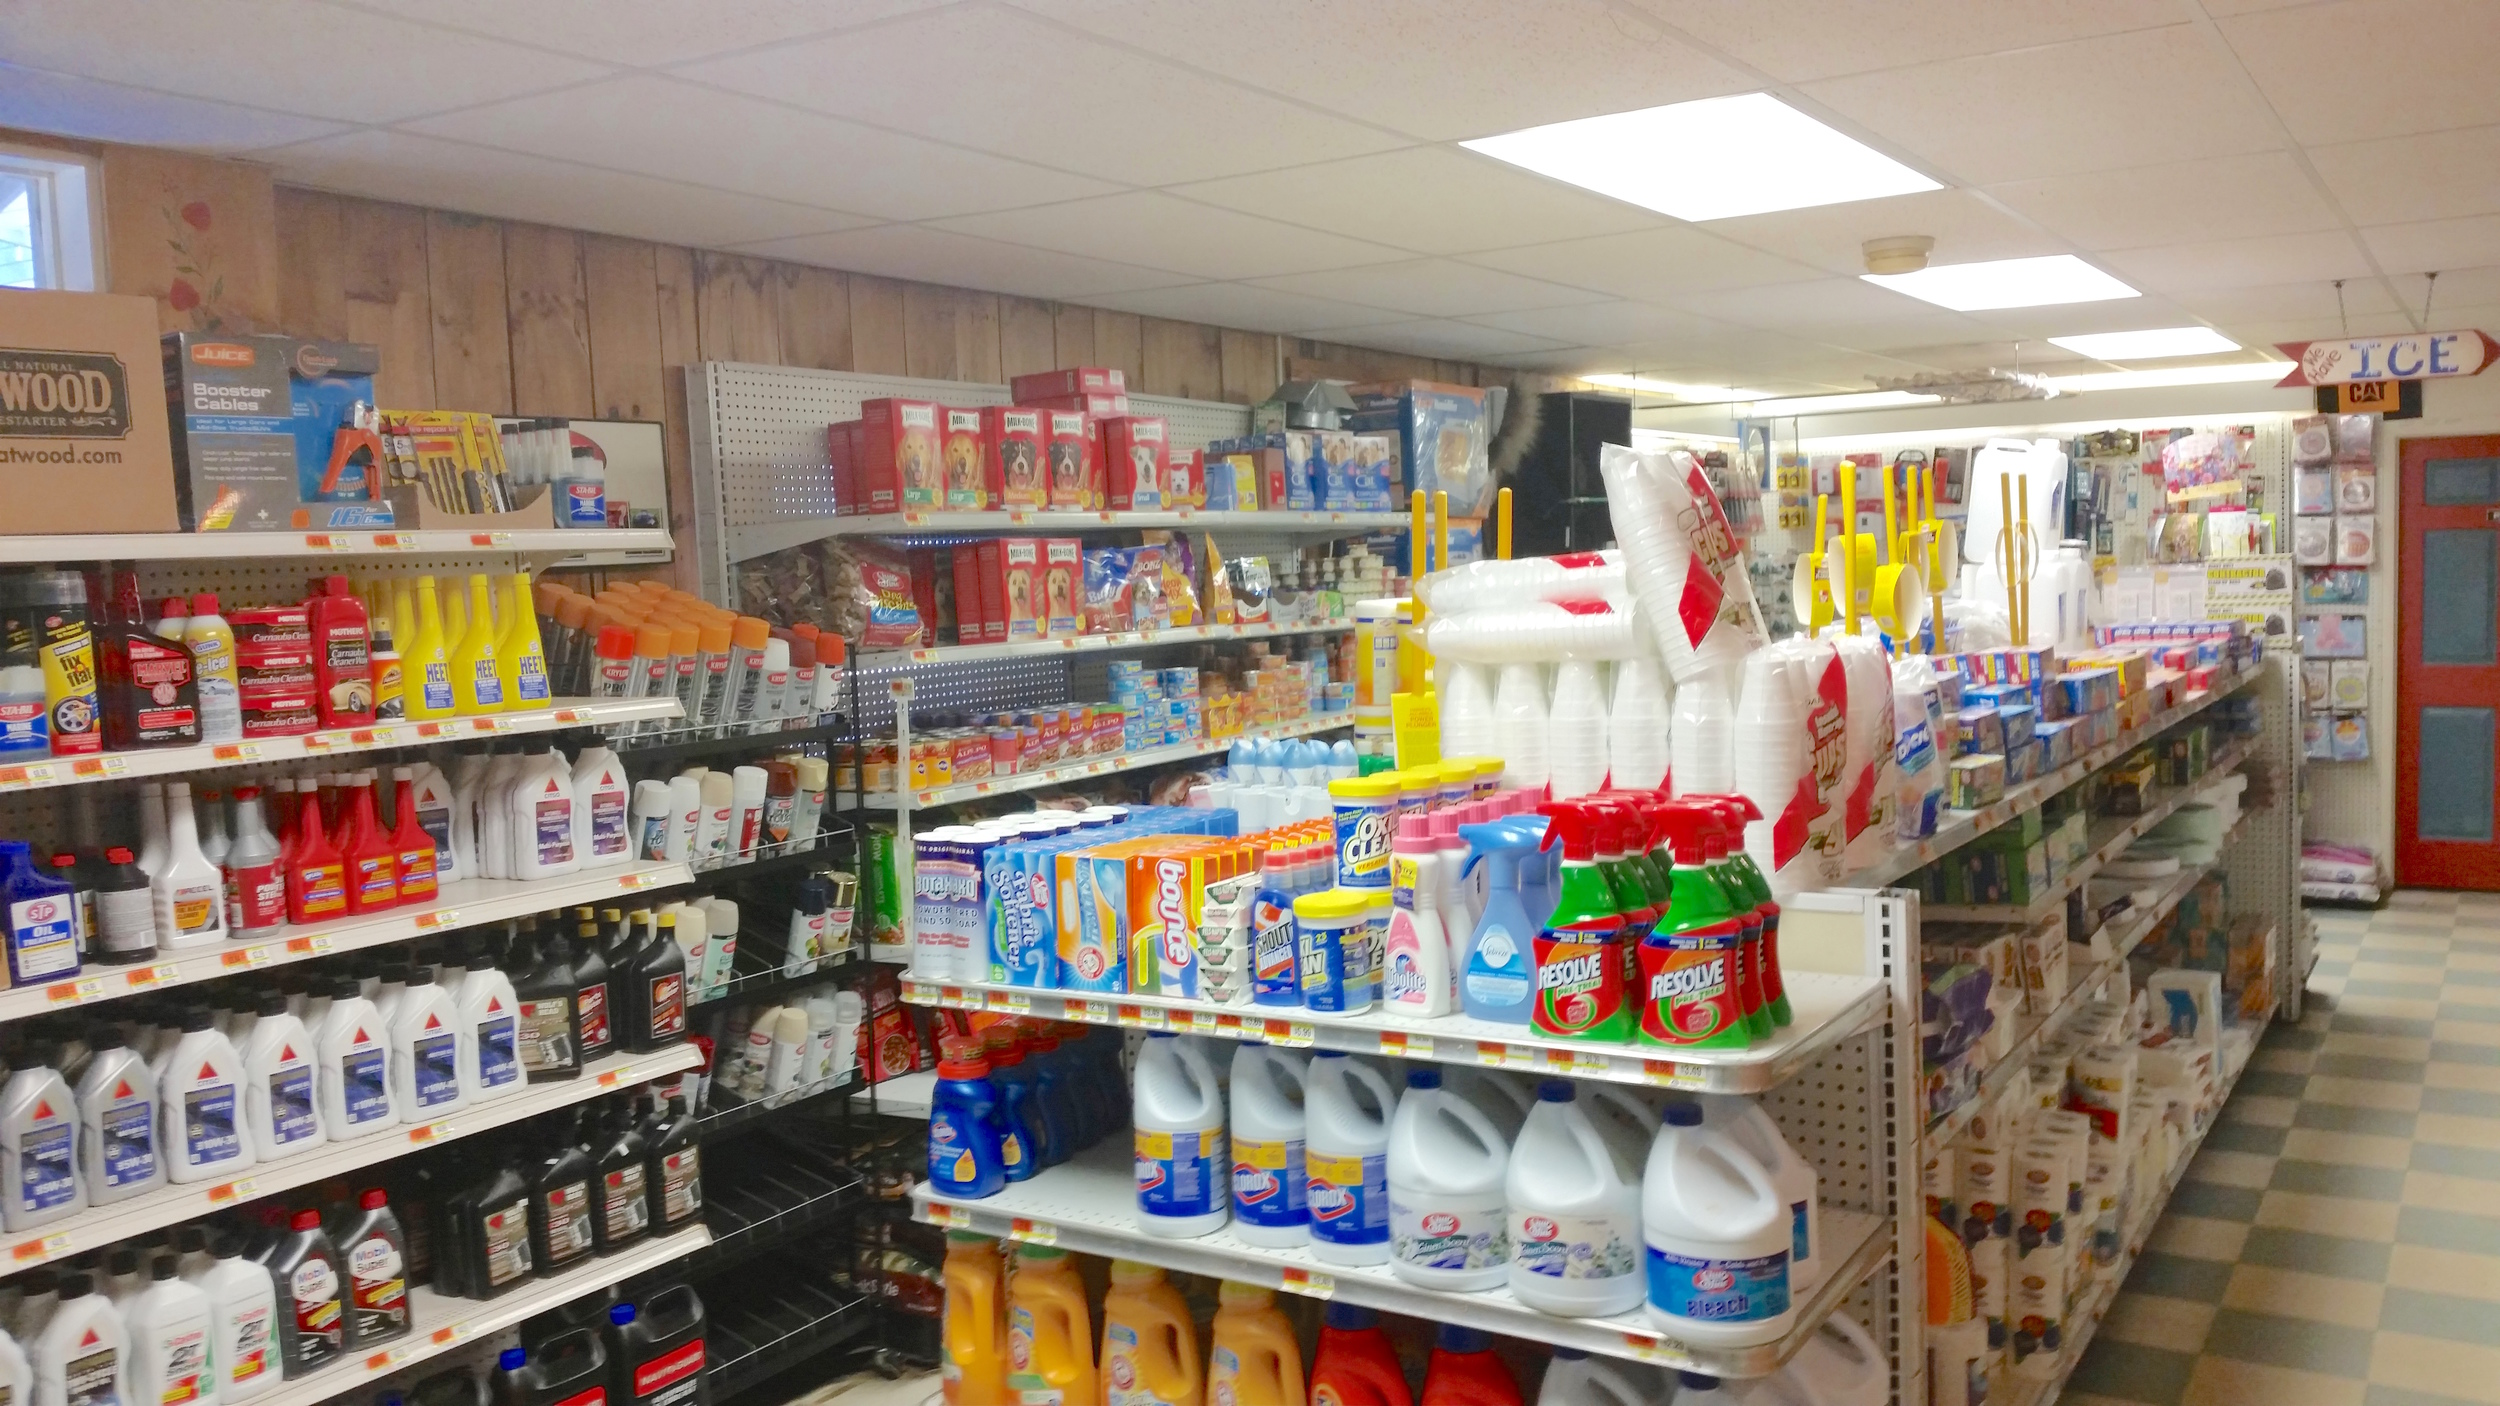 wardsboro_country_store_backroom_hardware.jpg